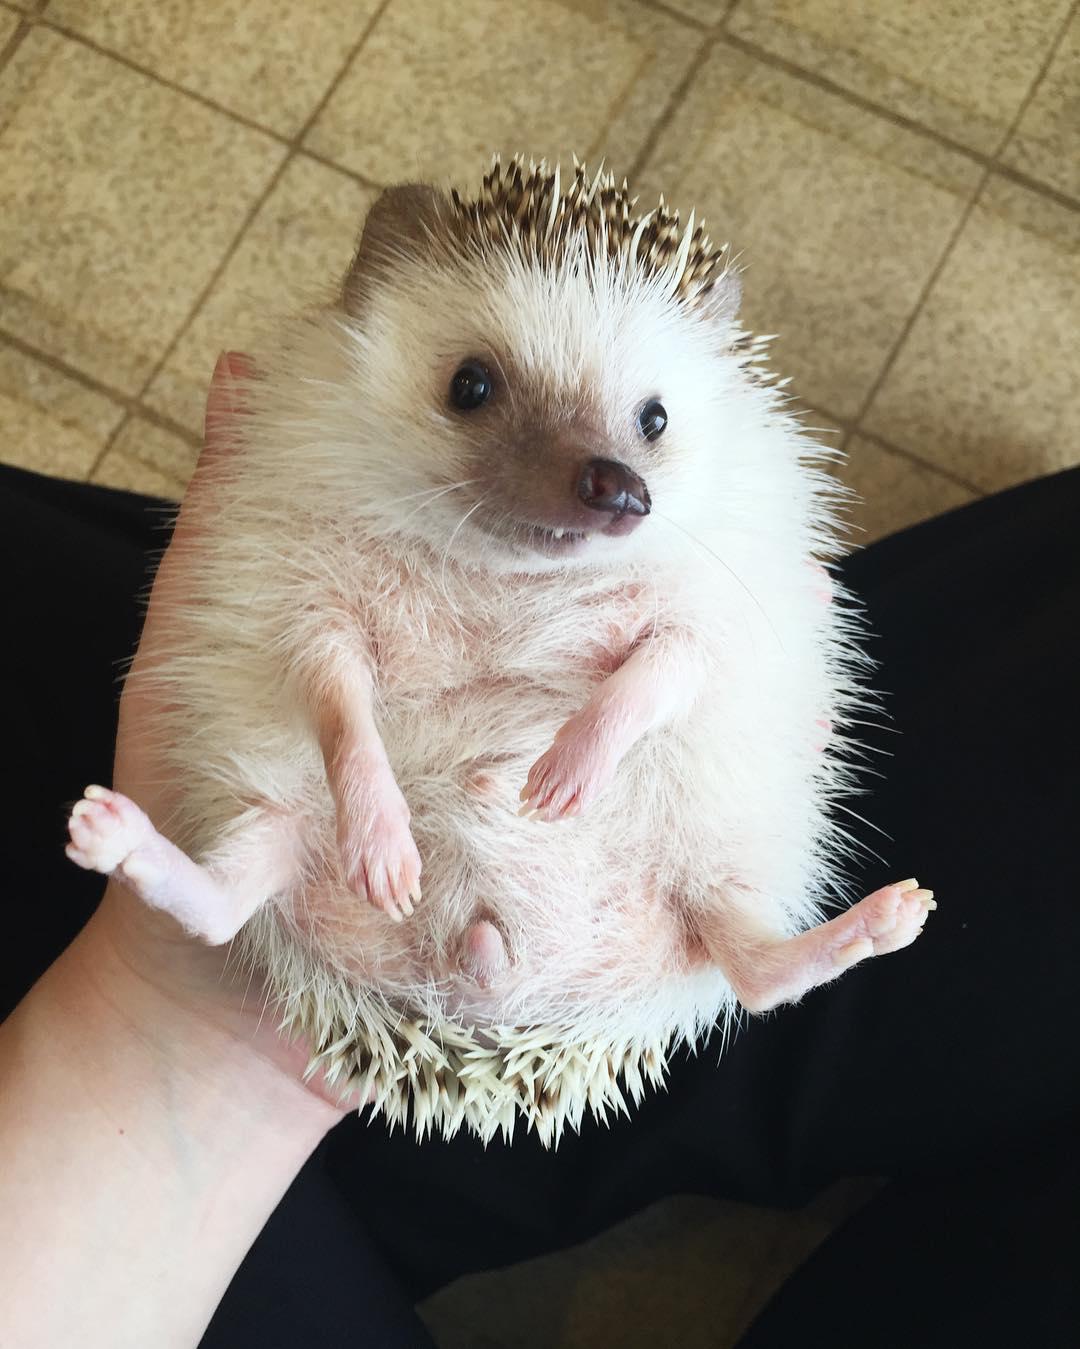 vampire-hedgehog-fangs-hodge-huffington-2